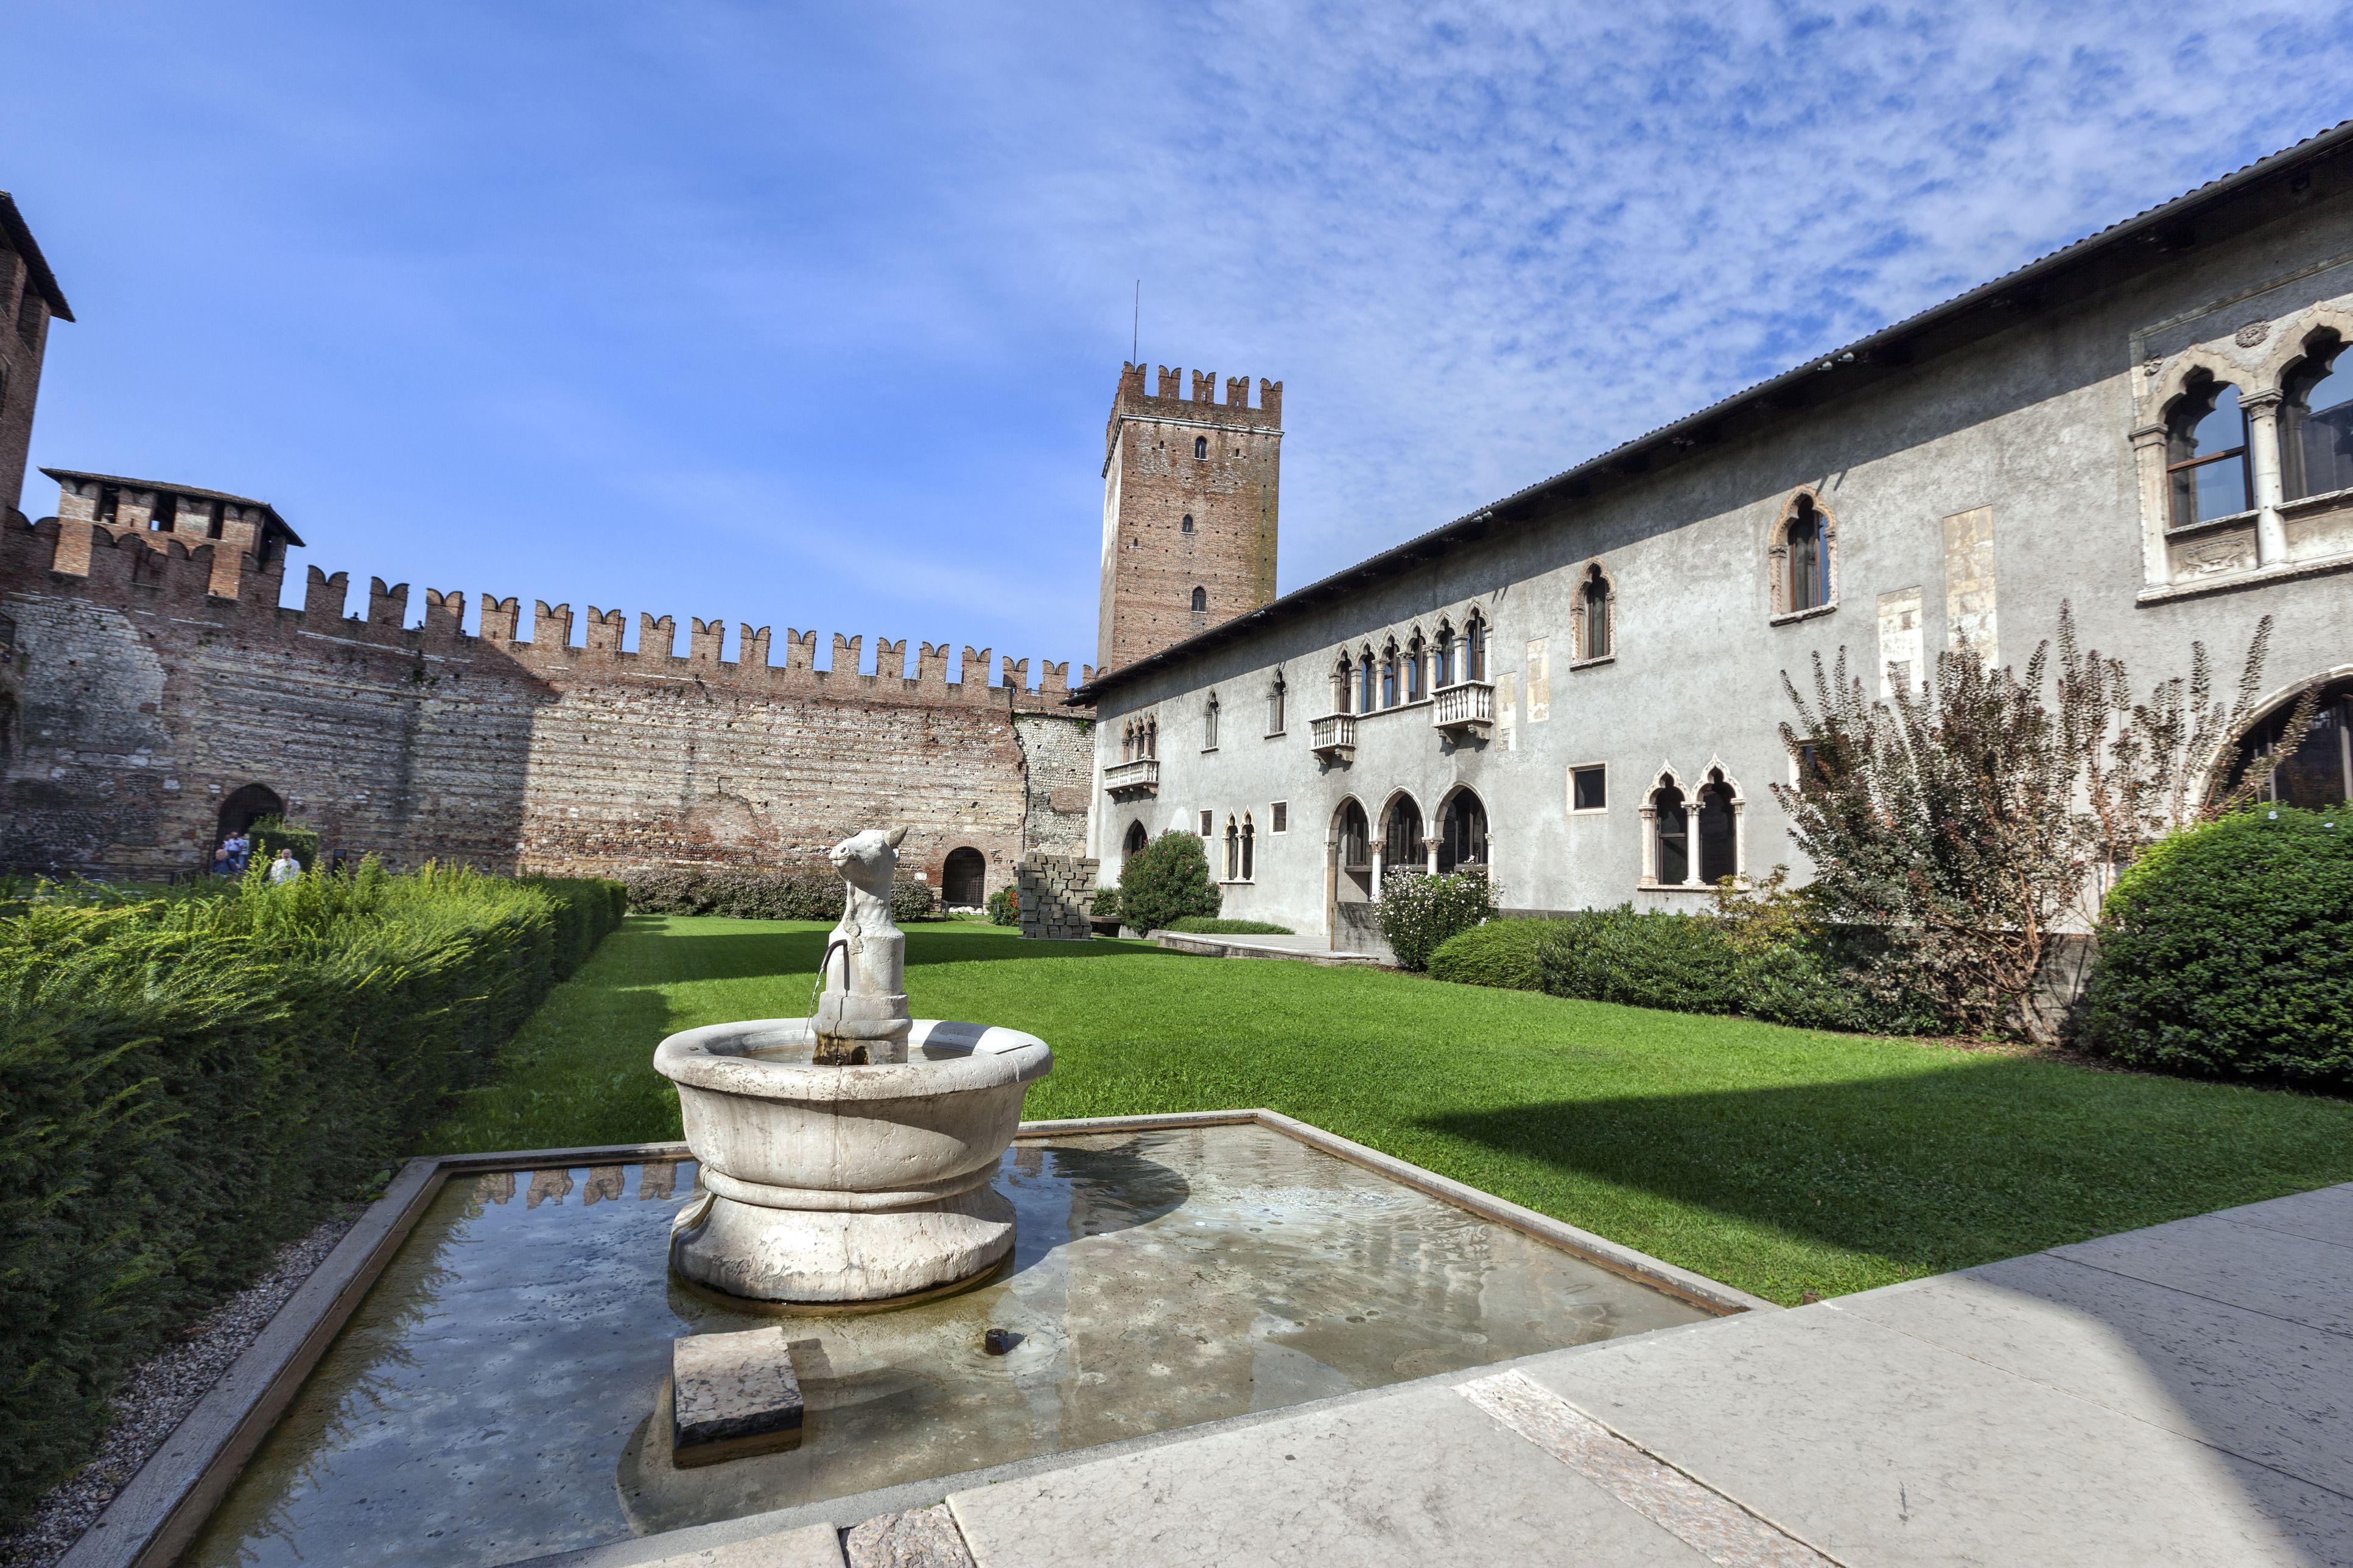 Inner courtyard of Castelvecchio